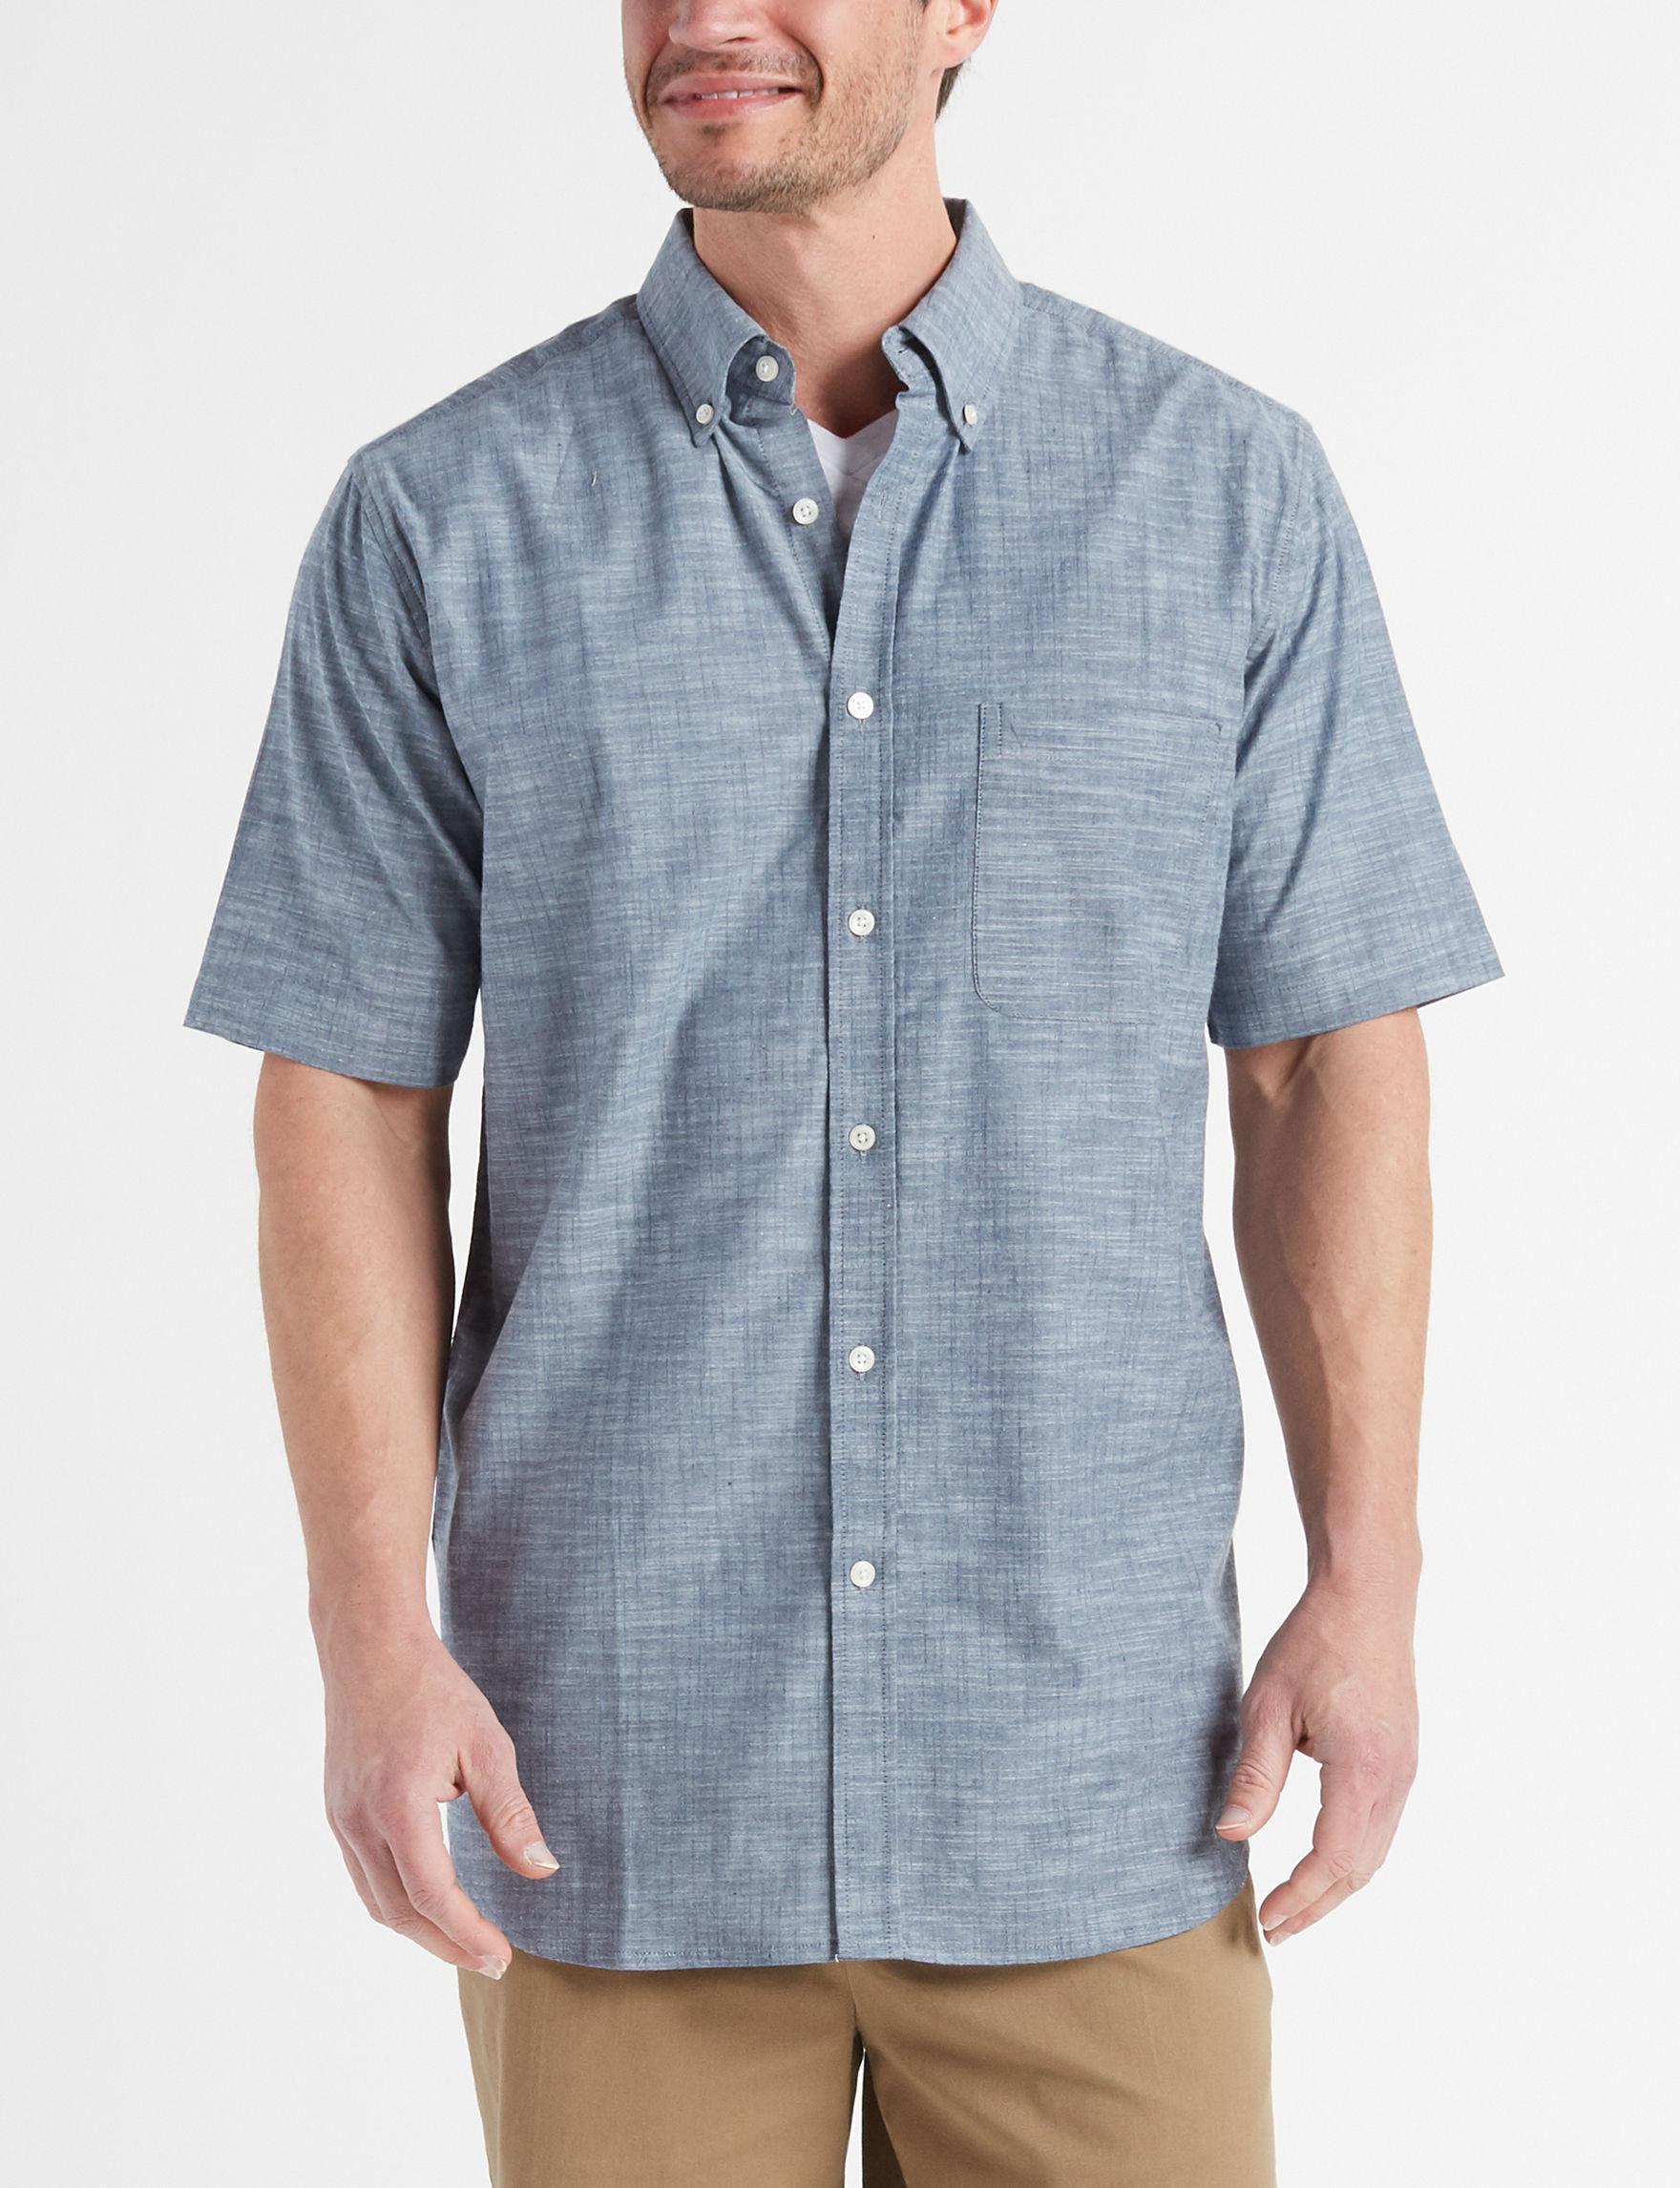 Sun River Indigo Casual Button Down Shirts